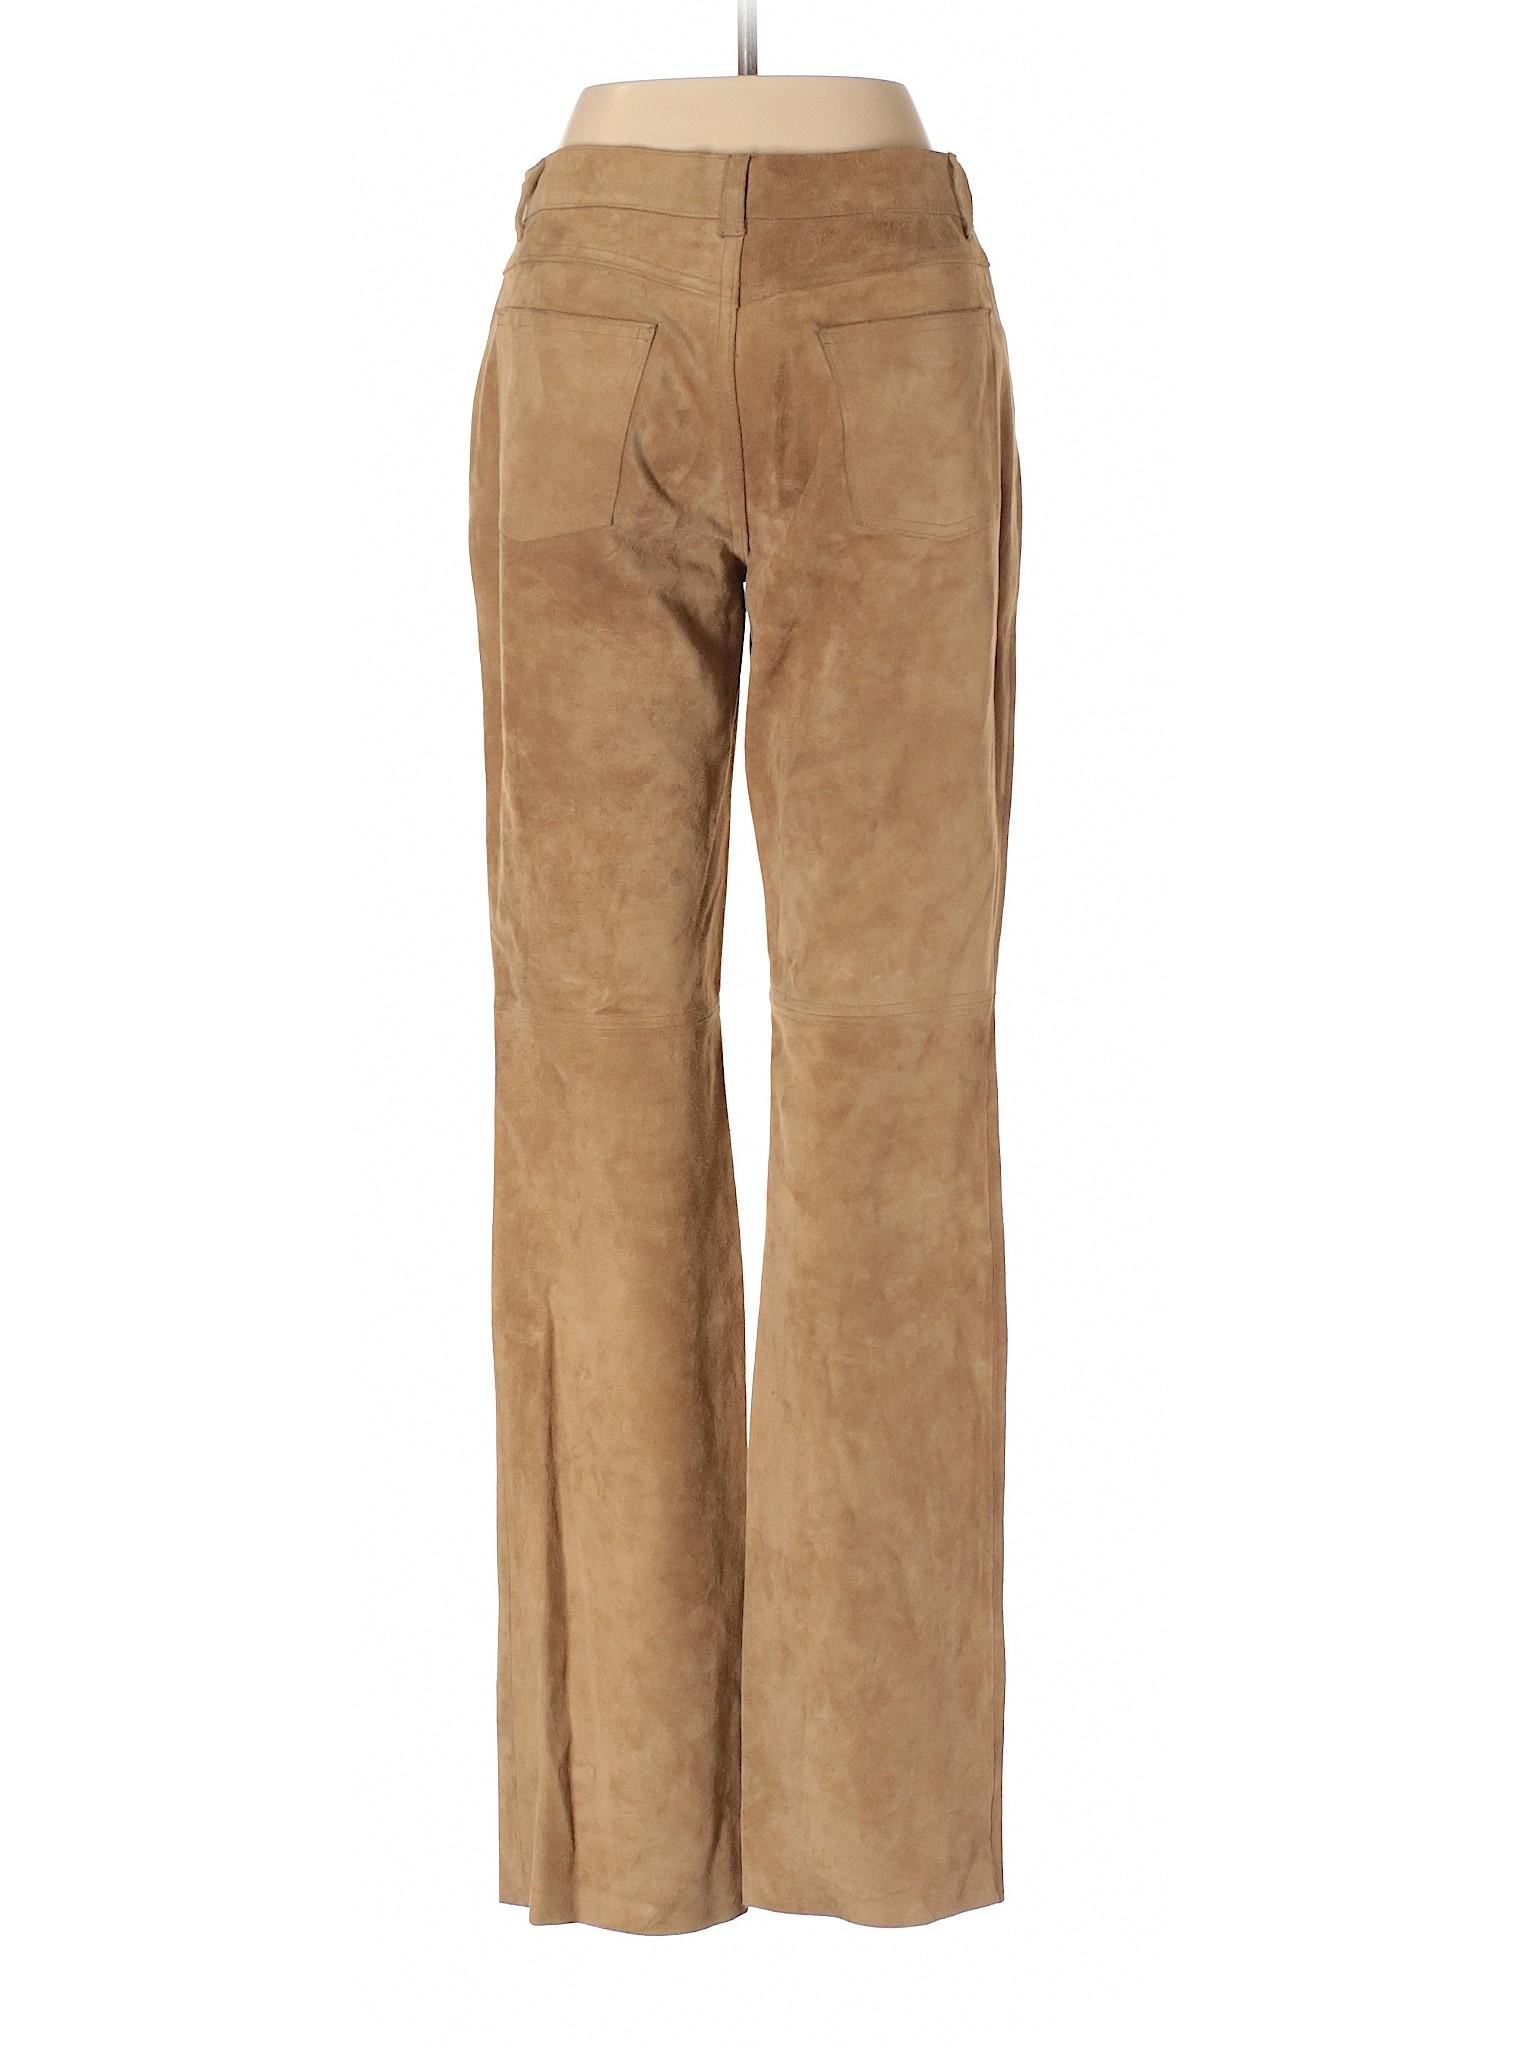 Leisure Republic Pants winter Banana Leather TTxAZ7